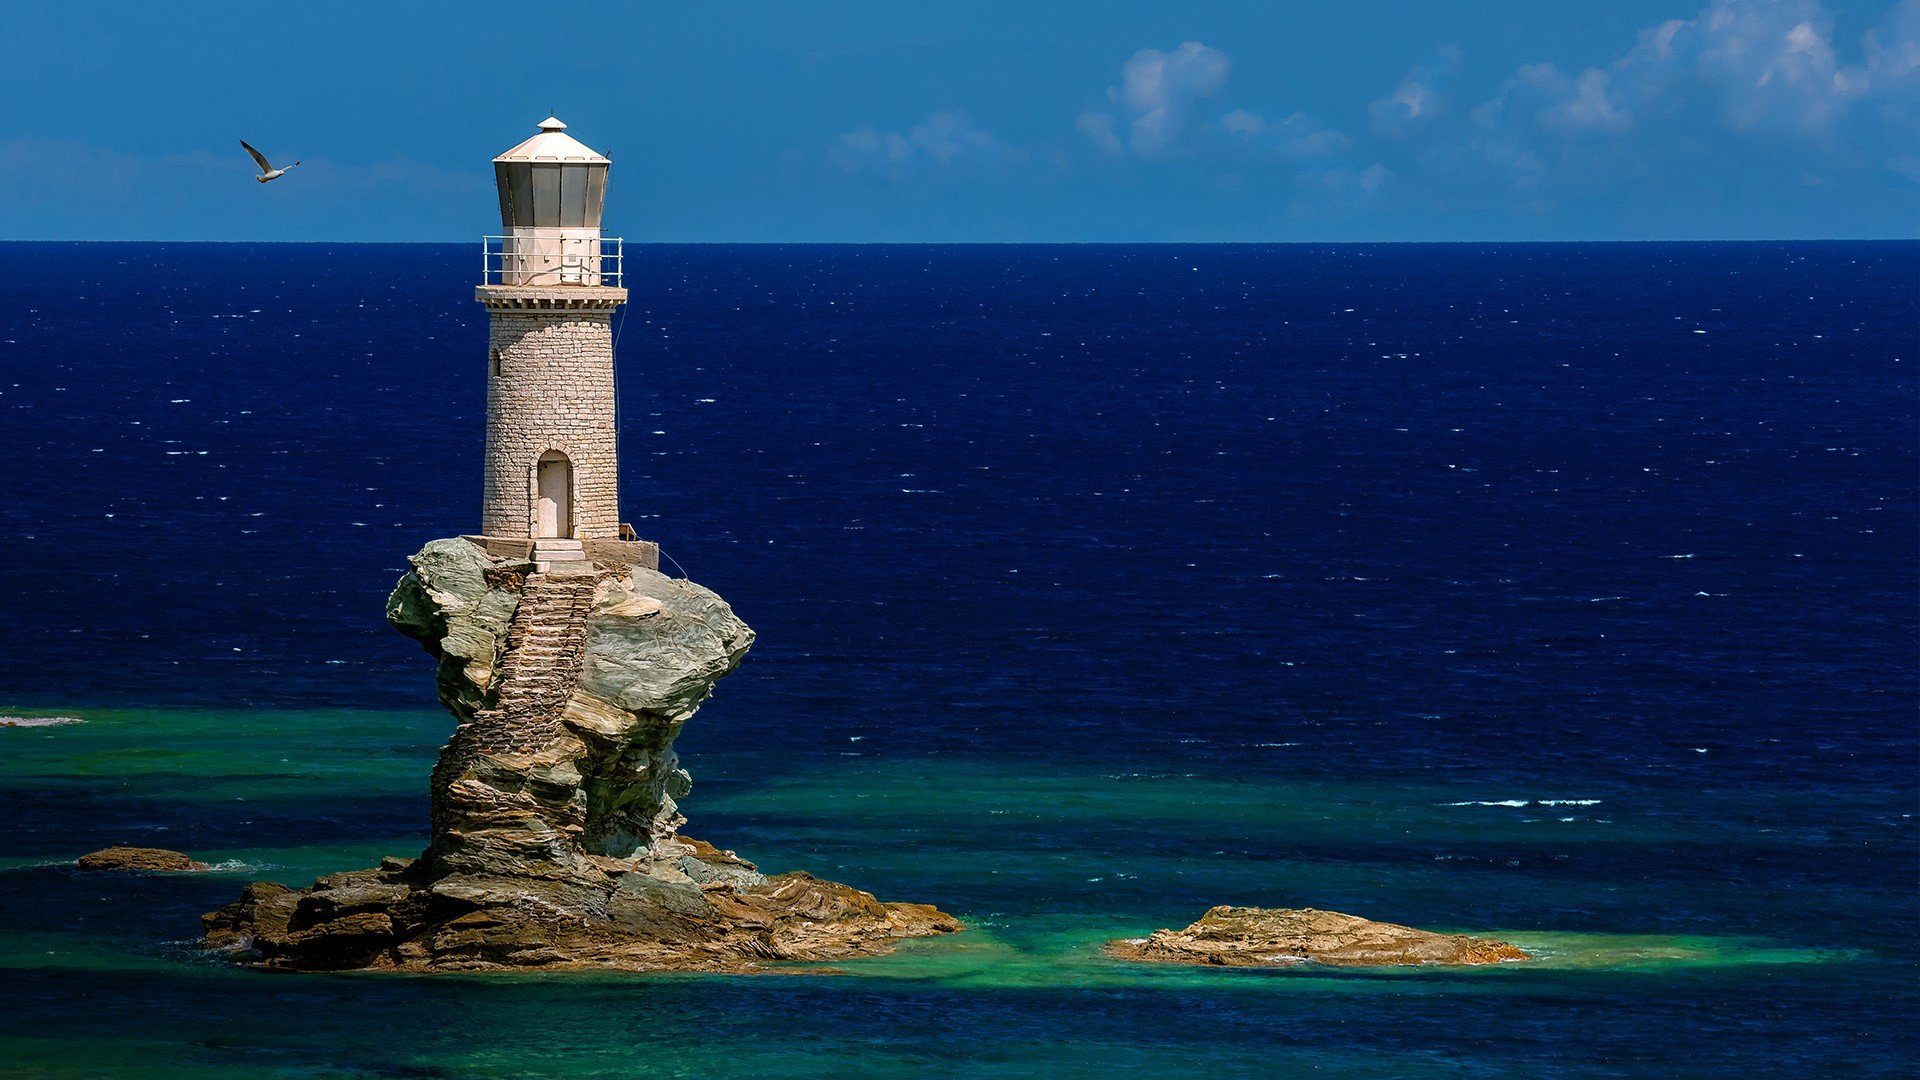 General 1920x1080 nature landscape water sea rocks lighthouse horizon clouds sky Faro Tourlitis Greece